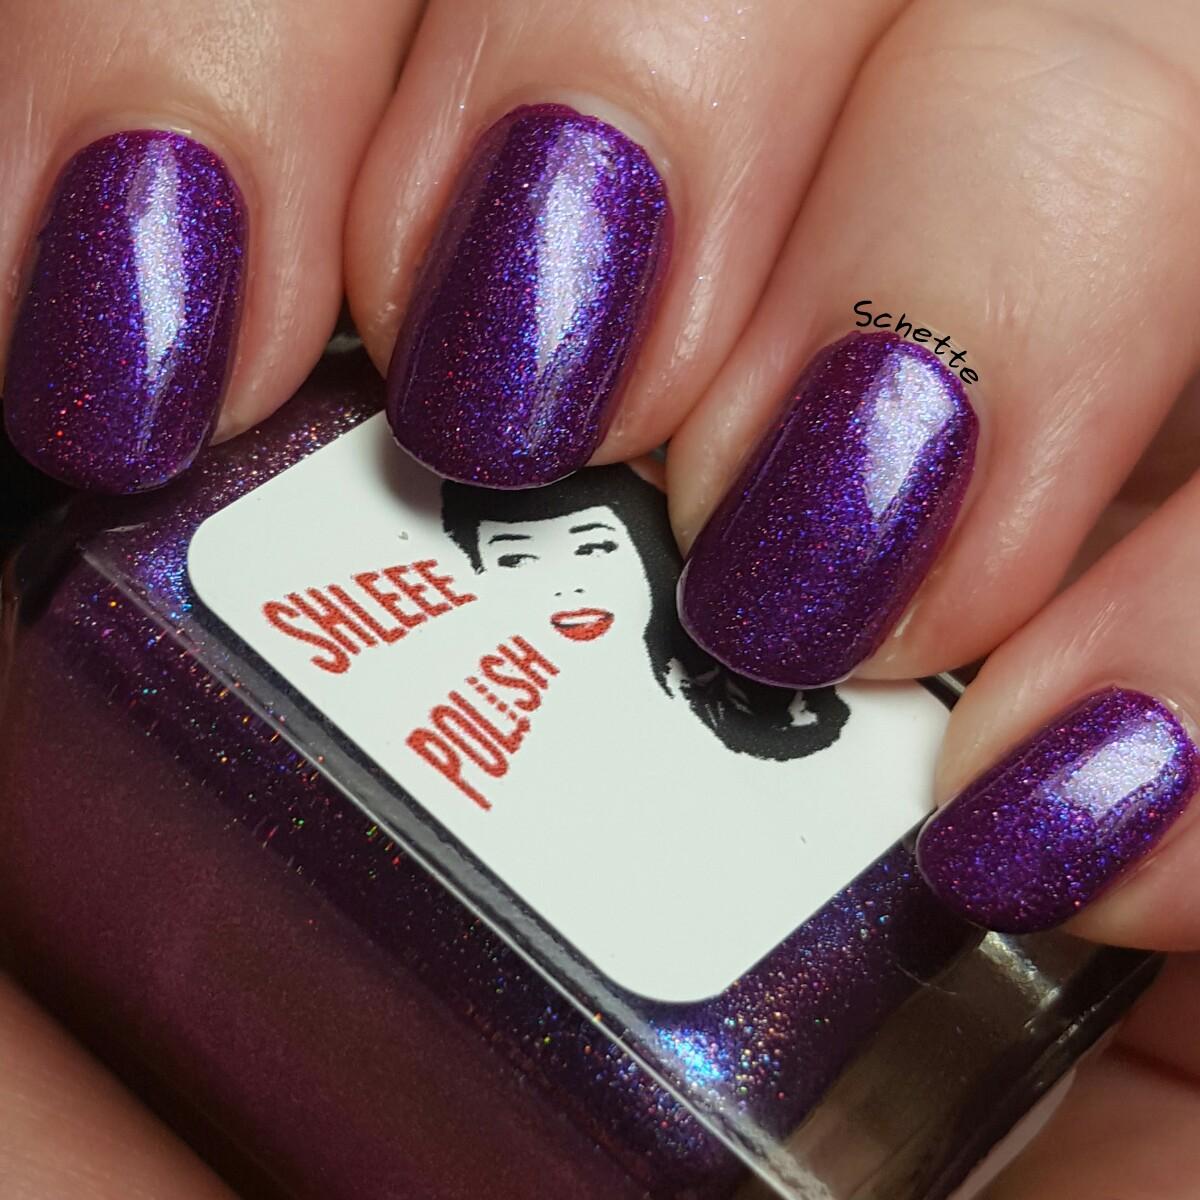 Shleee Polish - Video Girl